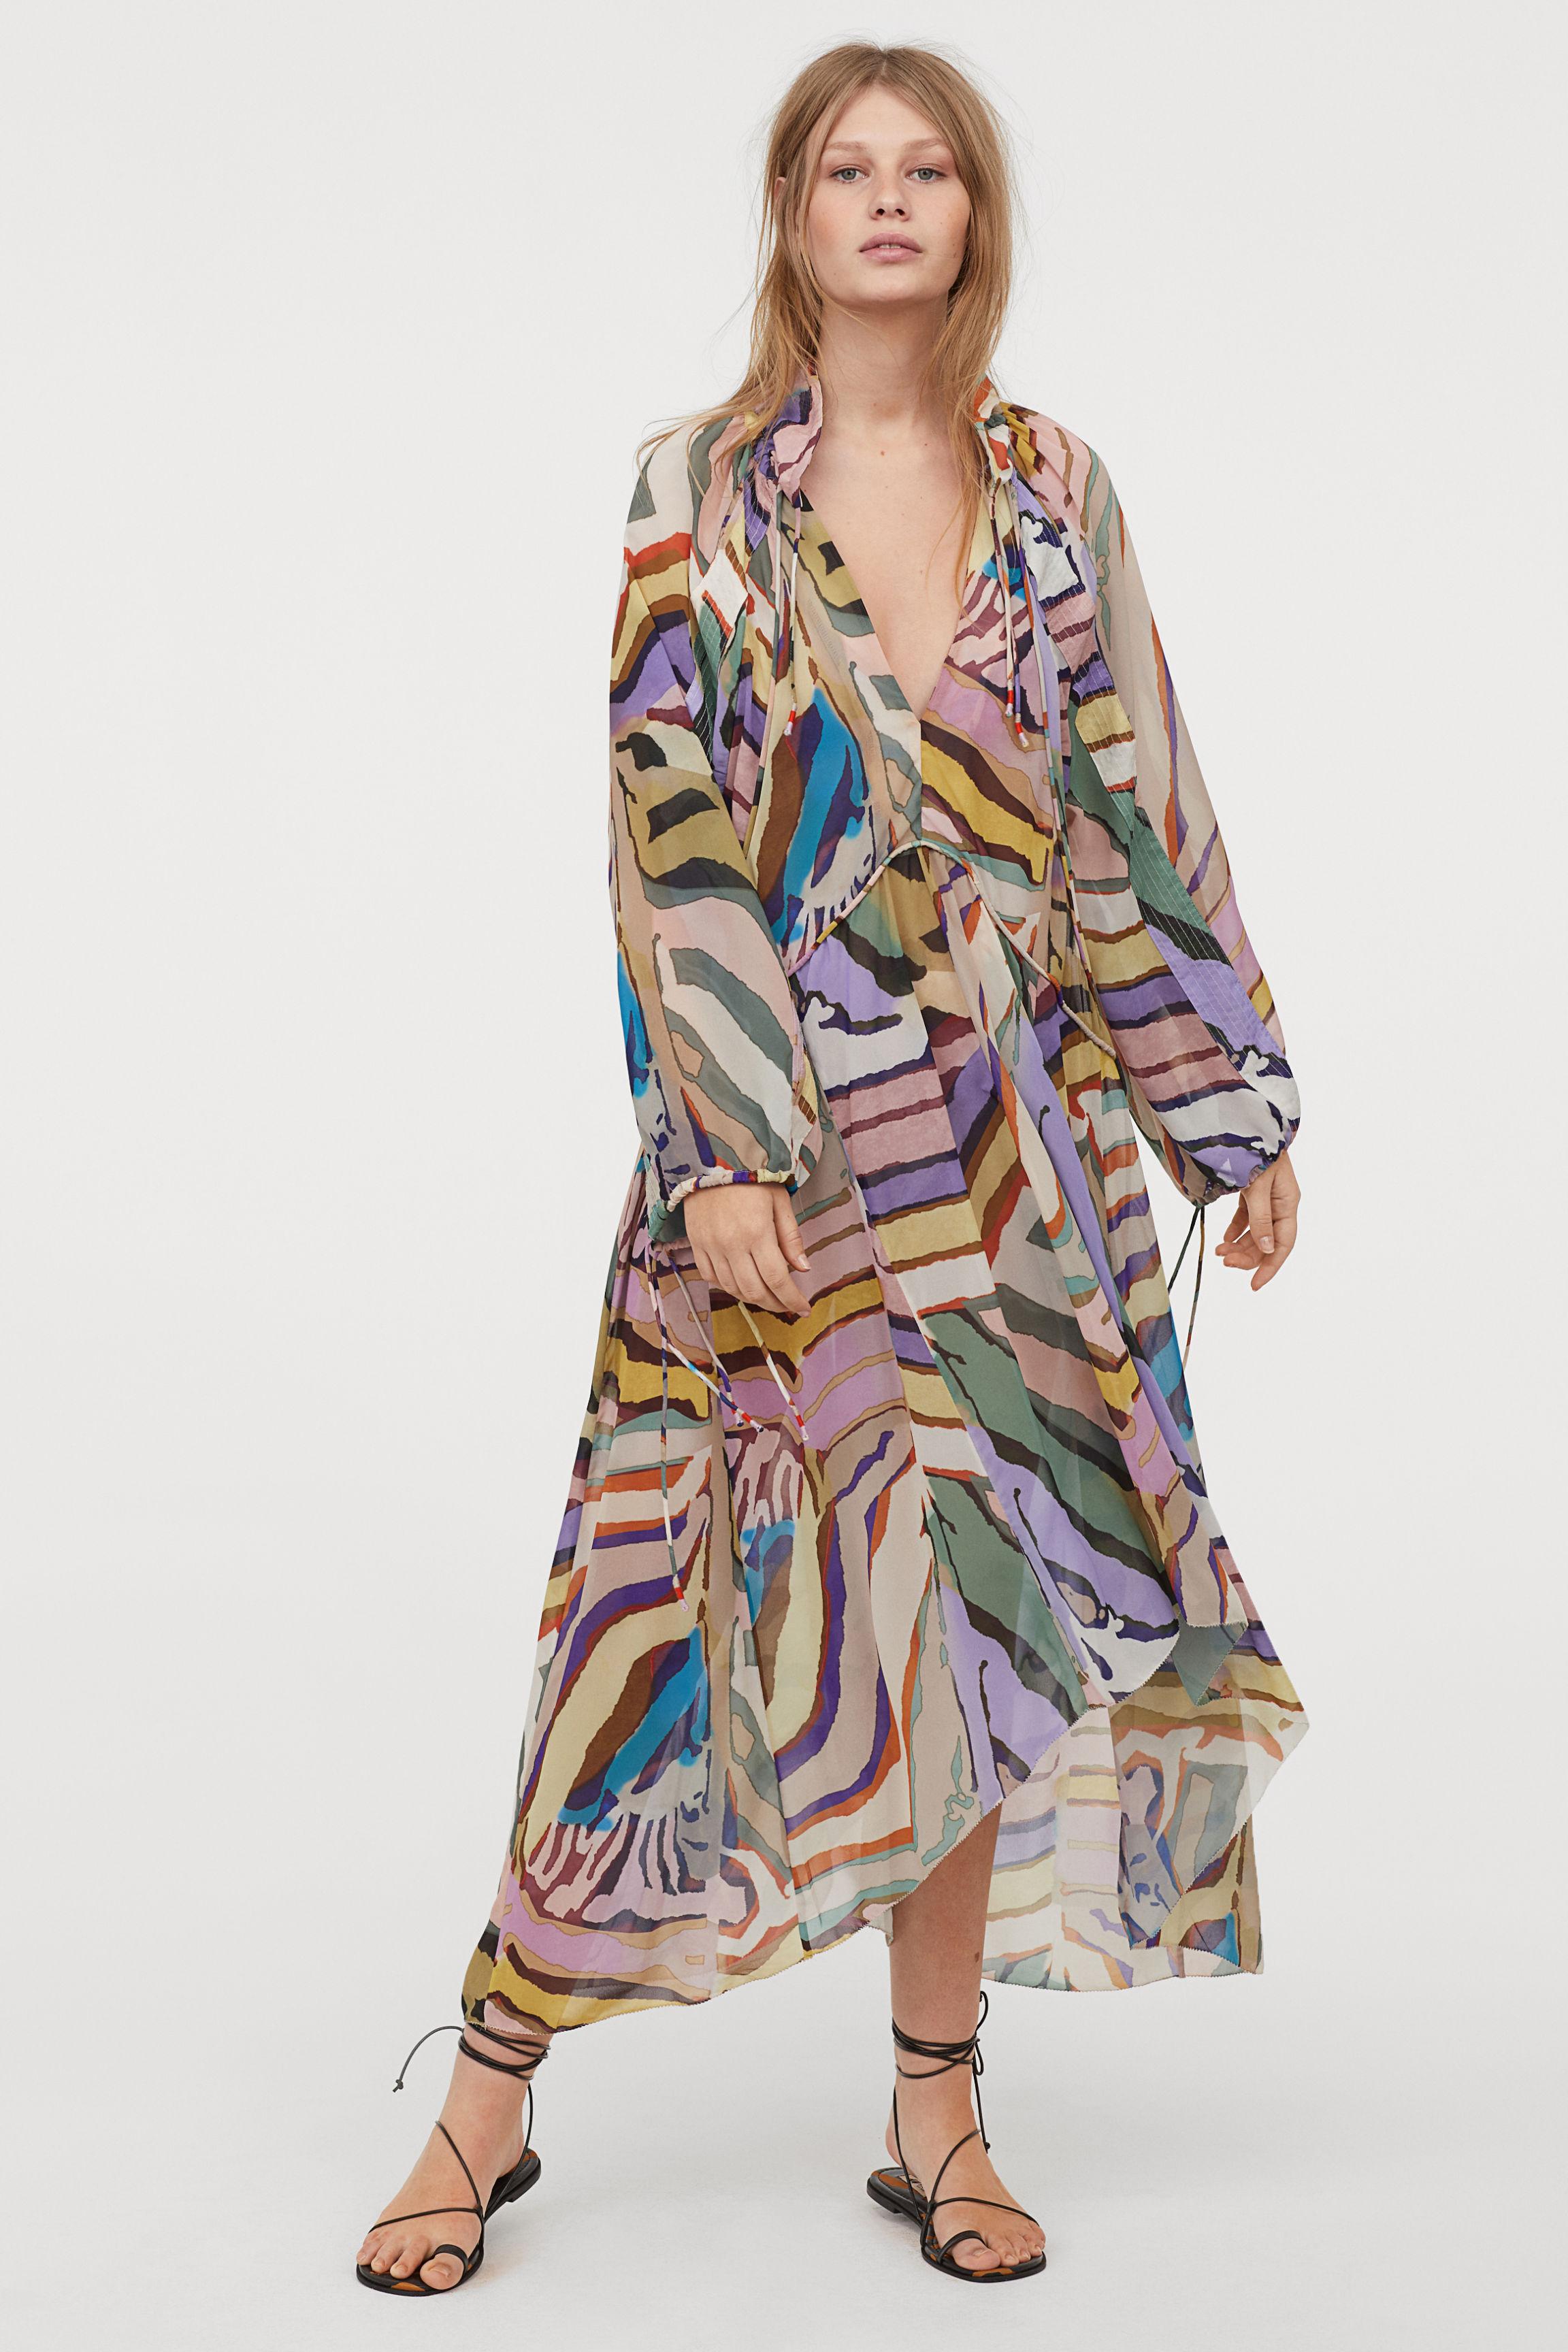 Patterned Dress - Multicolored - Ladies   H&M US